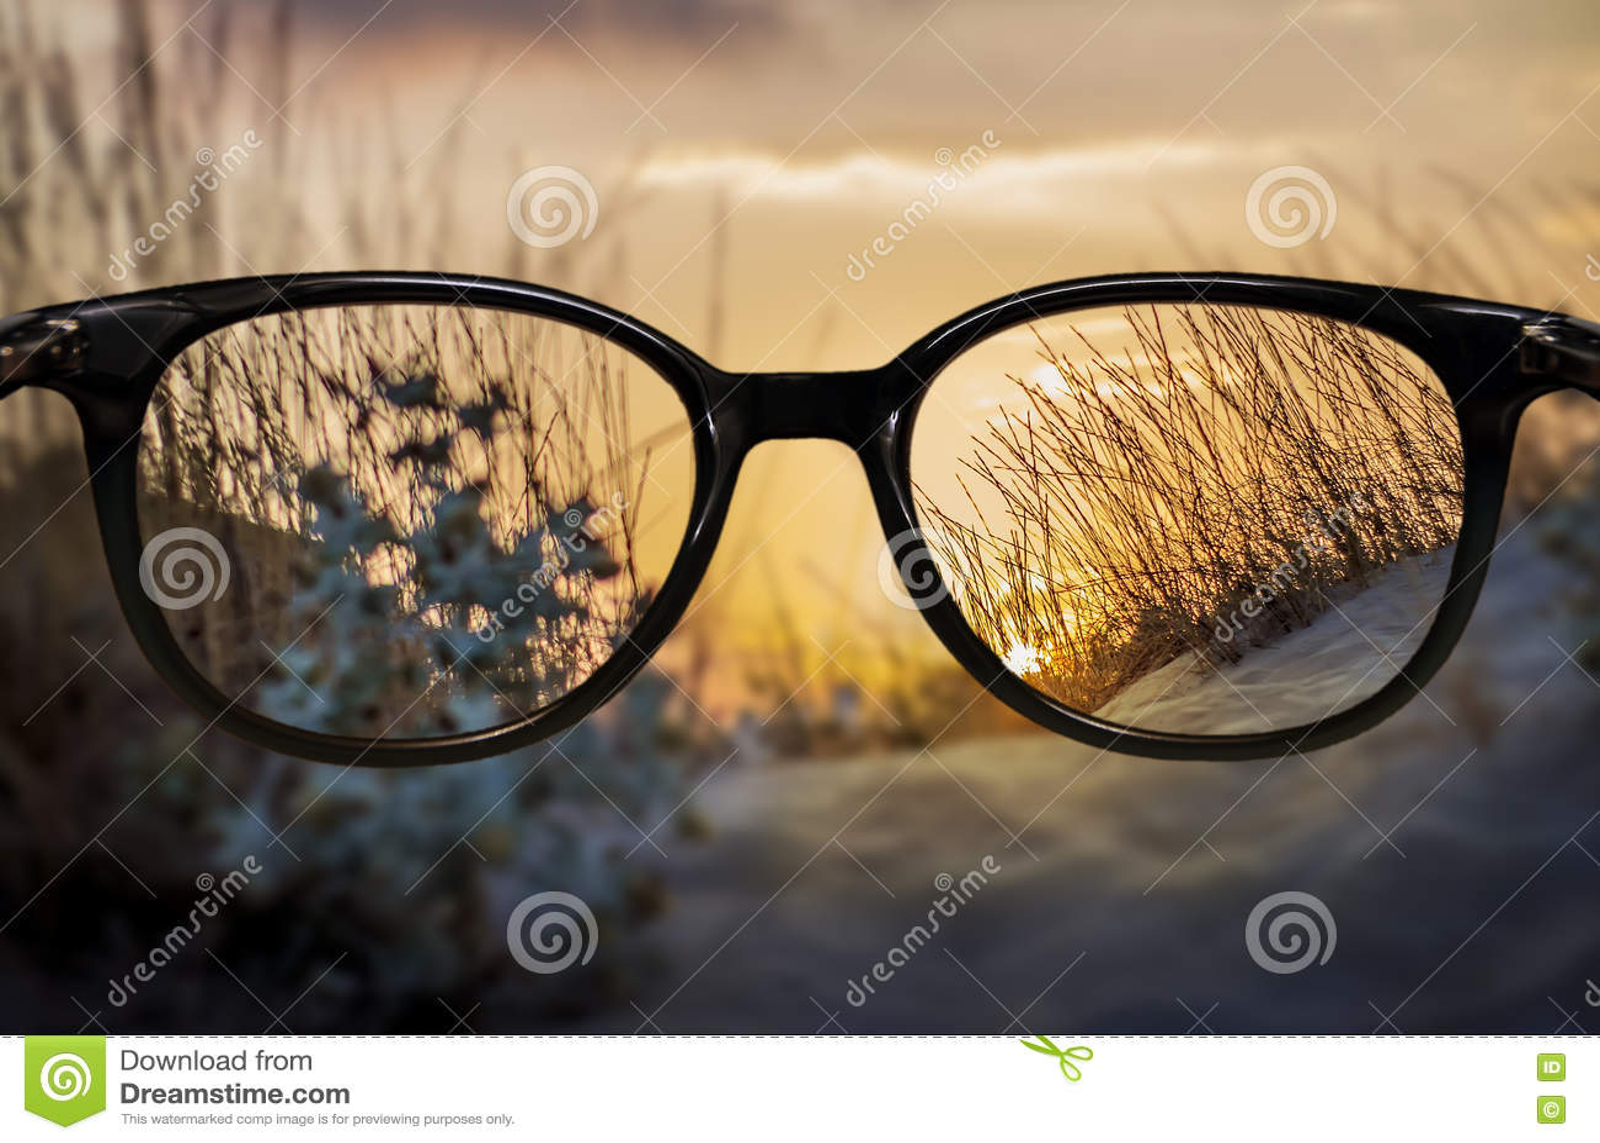 Clear vision through glasses